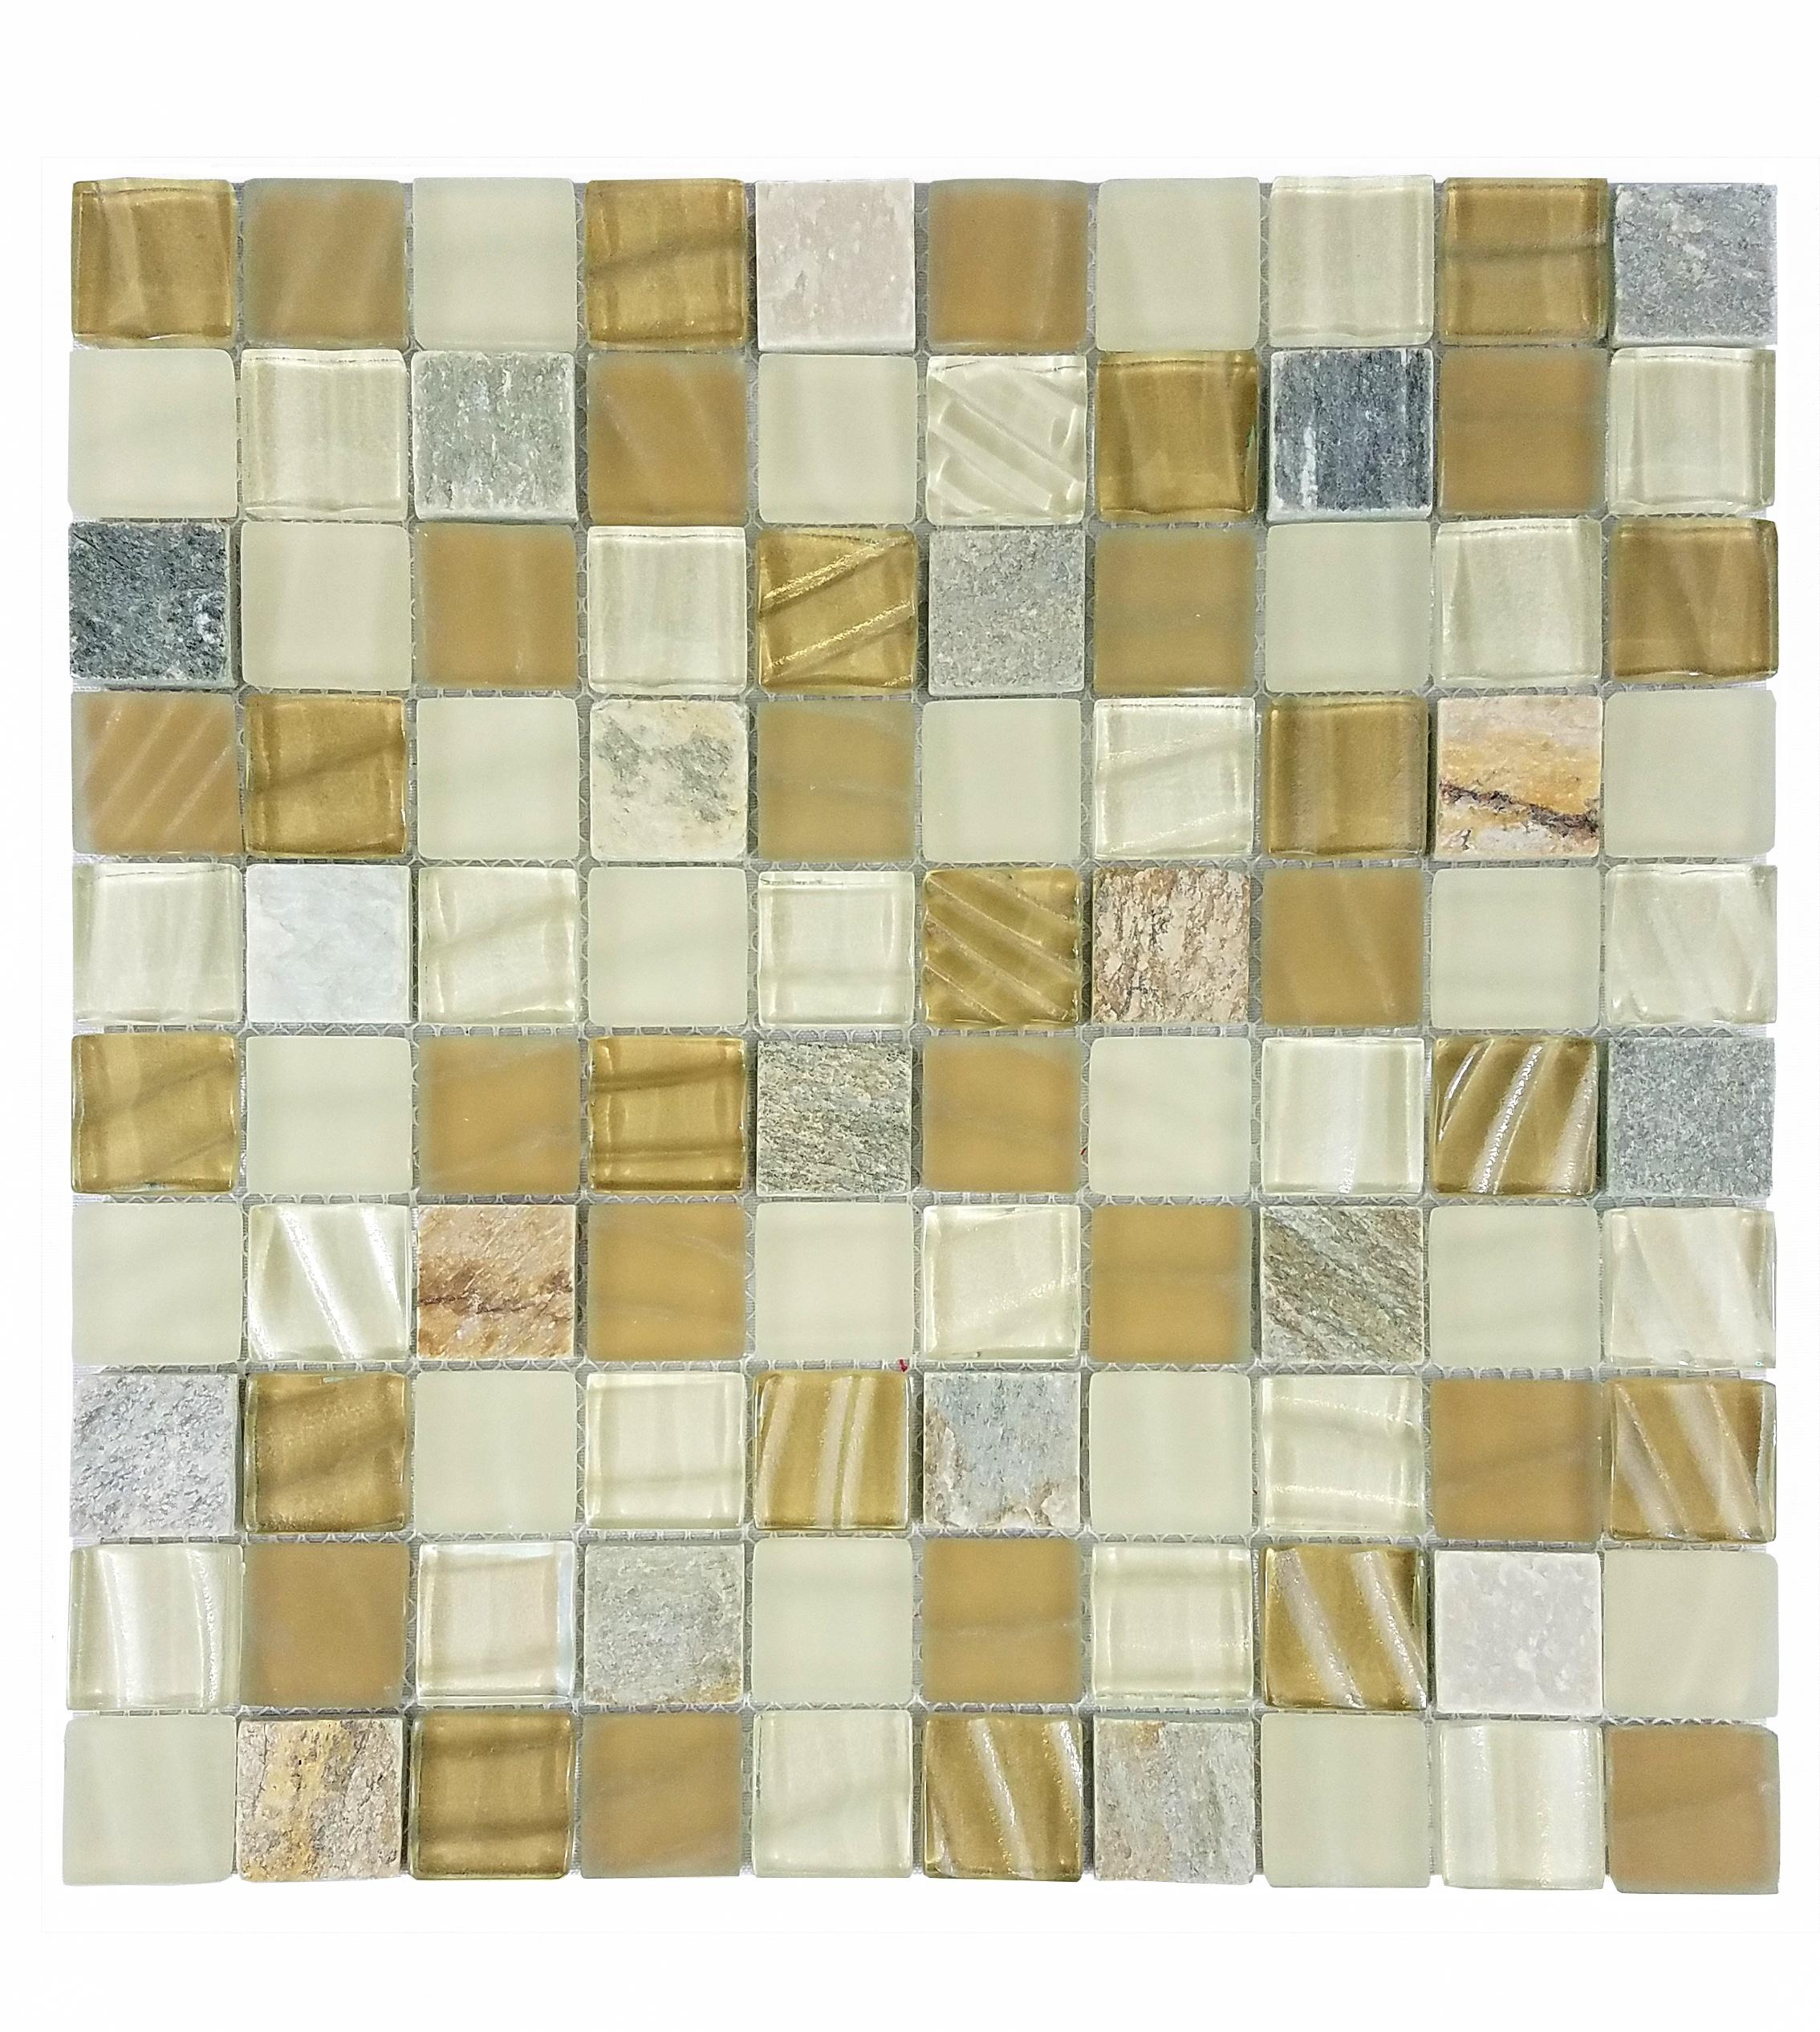 "New Era II 1"" x 1"" Multi Finish Beige Glass and Stone Square Backsplash Mosaic Wall & Floor Tile"